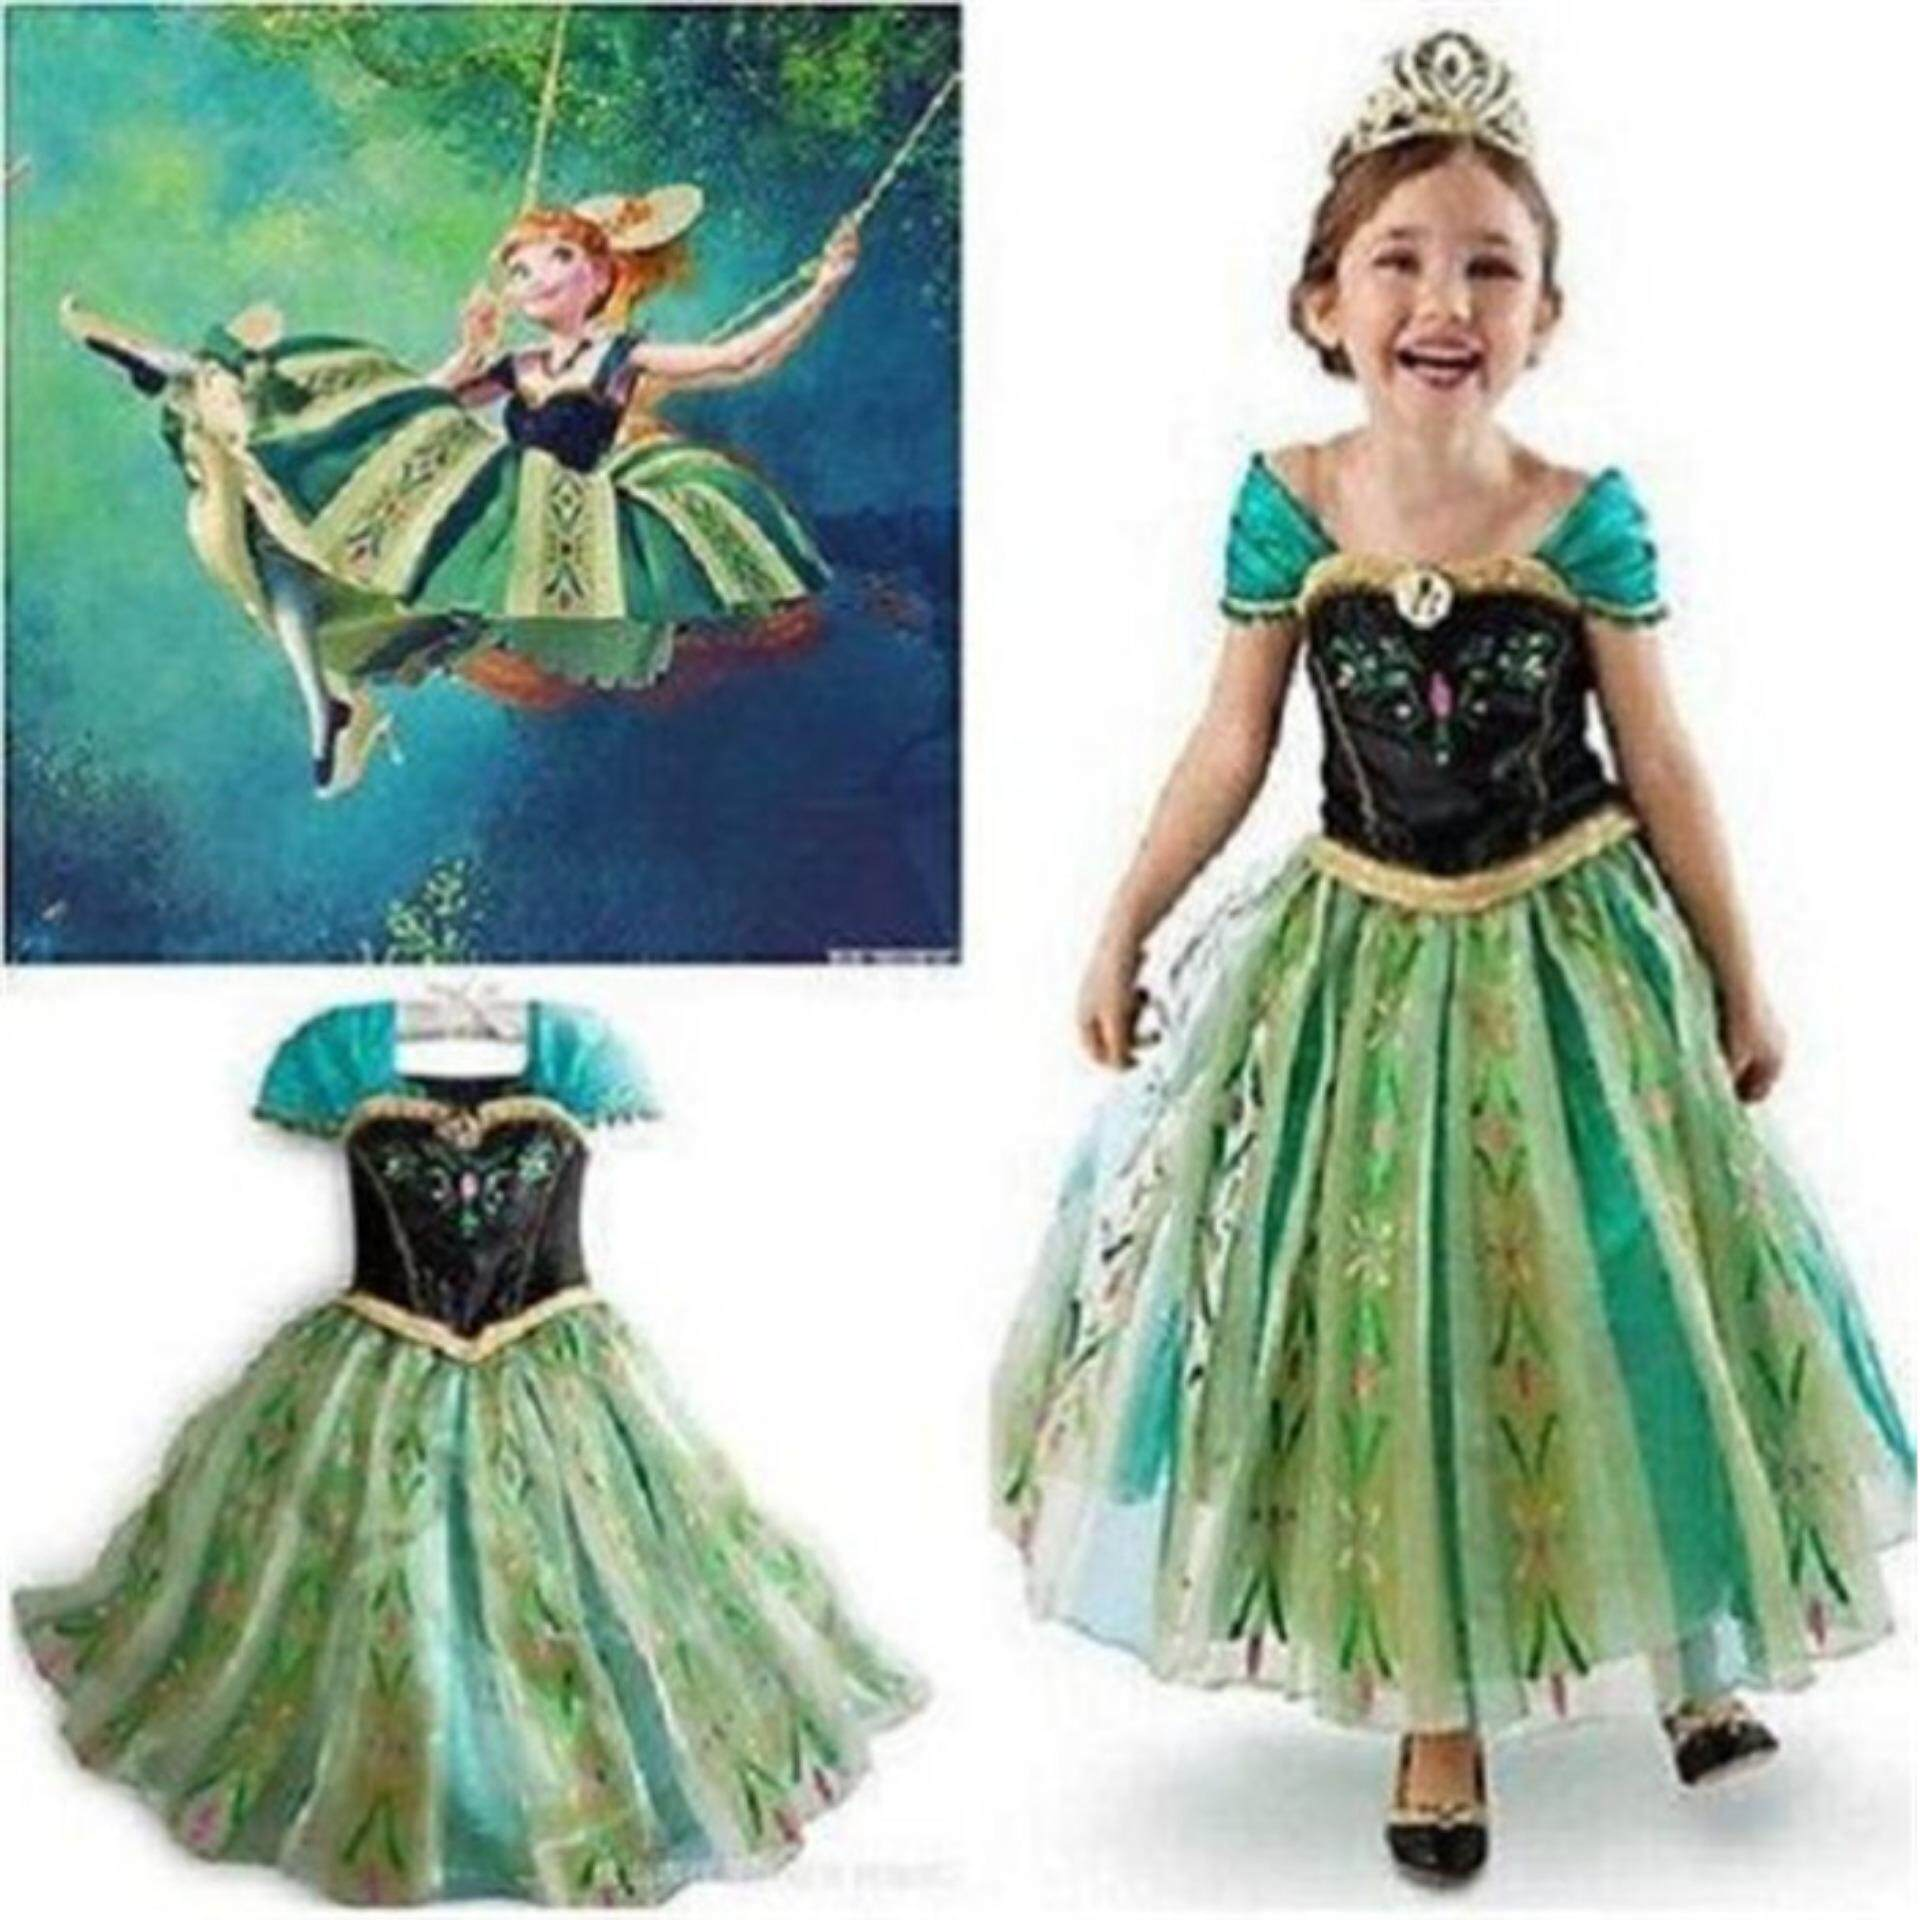 dd78390c7254 Catwalk Frozen Anna Costume Girls Queen Princess Cosplay Party Fancy Formal  Dress 2-9Y